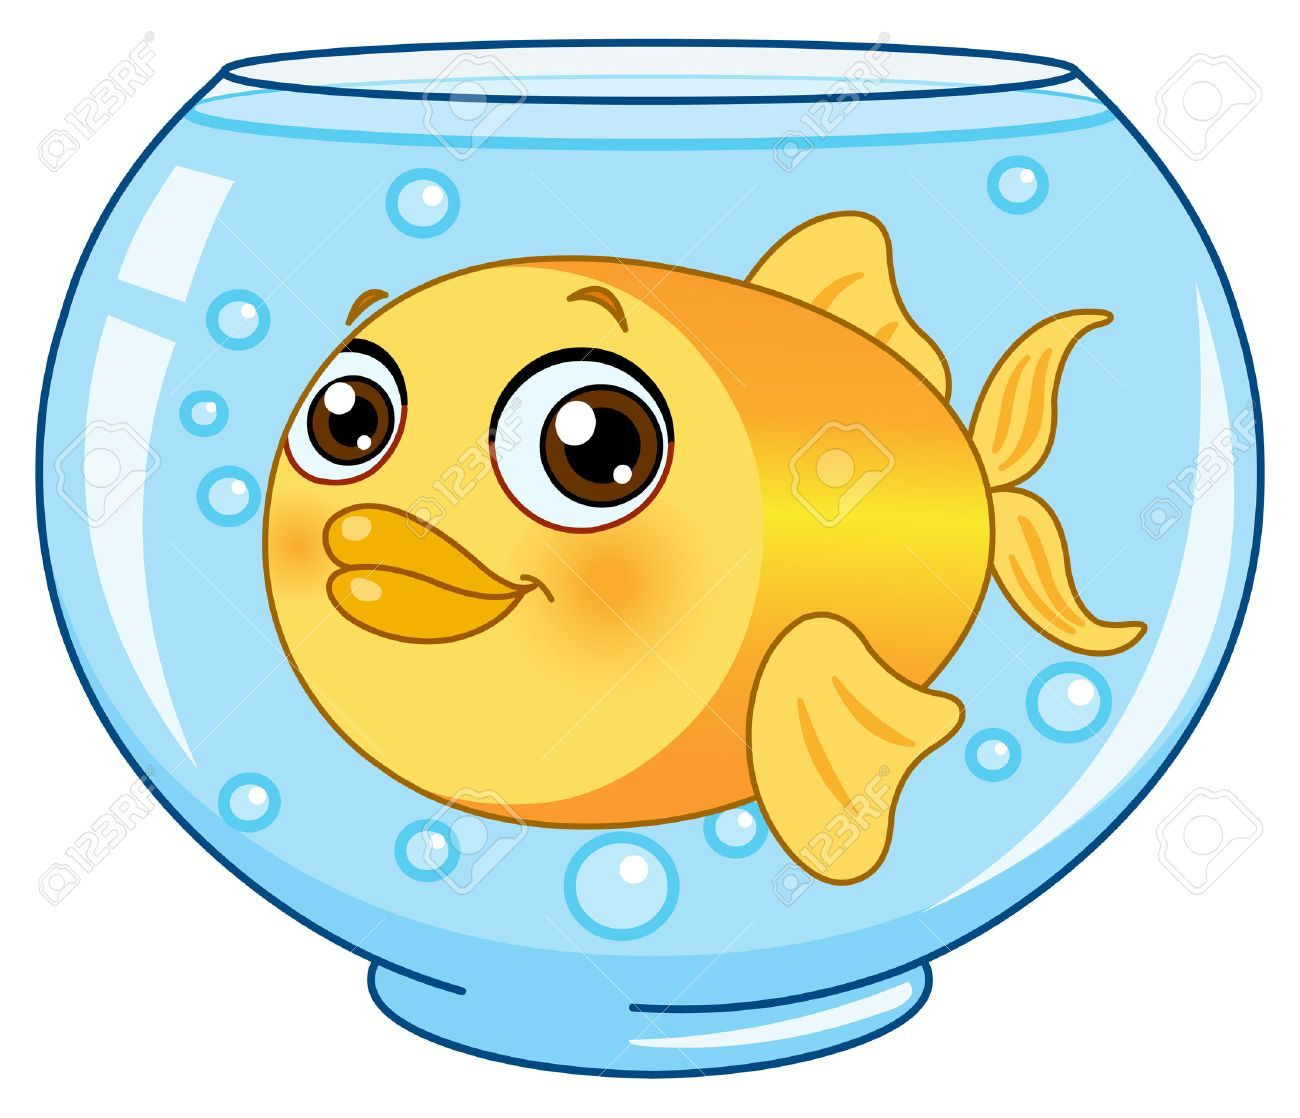 Fish in bowl clipart 5 » Clipart Portal.